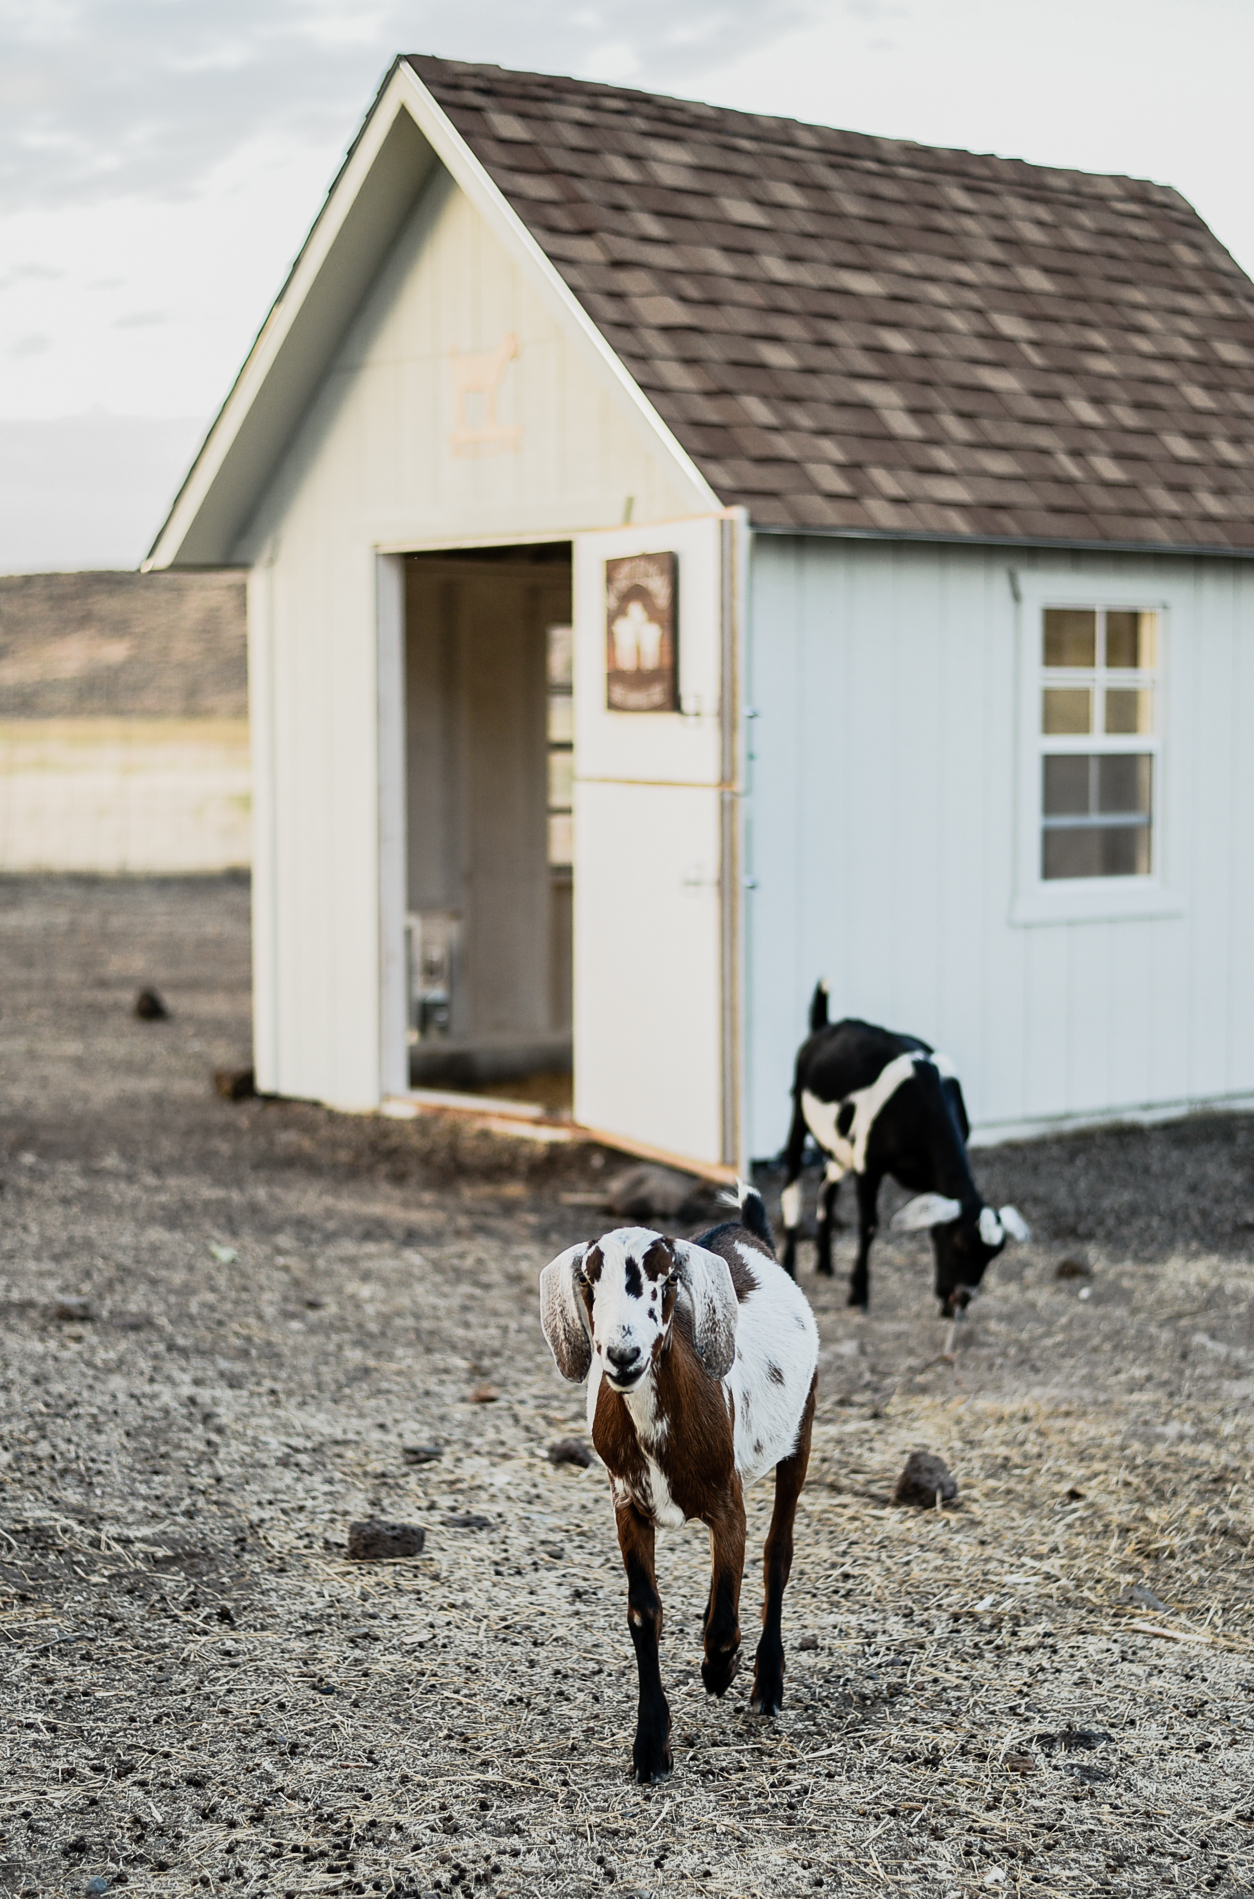 Basic Goat Care Information: 15 Things I wish I knew Before Getting Goats | boxwoodavenue.com